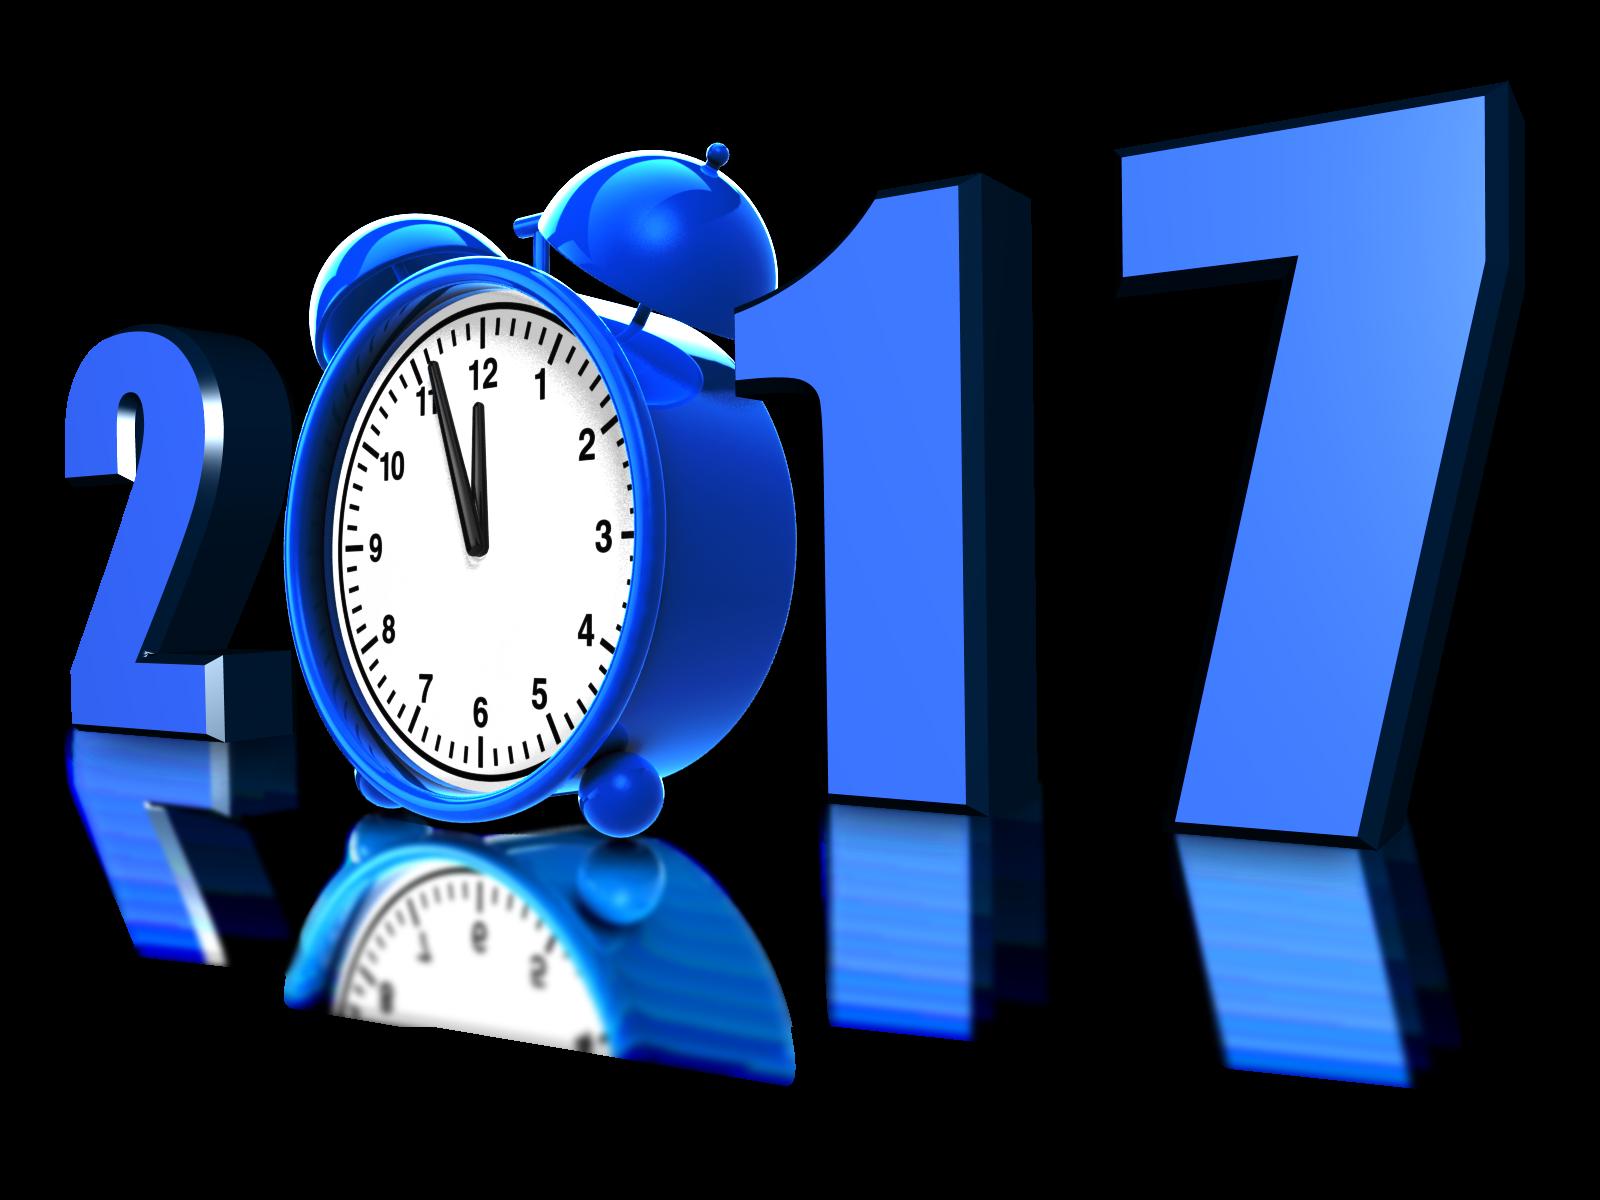 custom_year_alarm_clock_1600_clr_13510-1.png